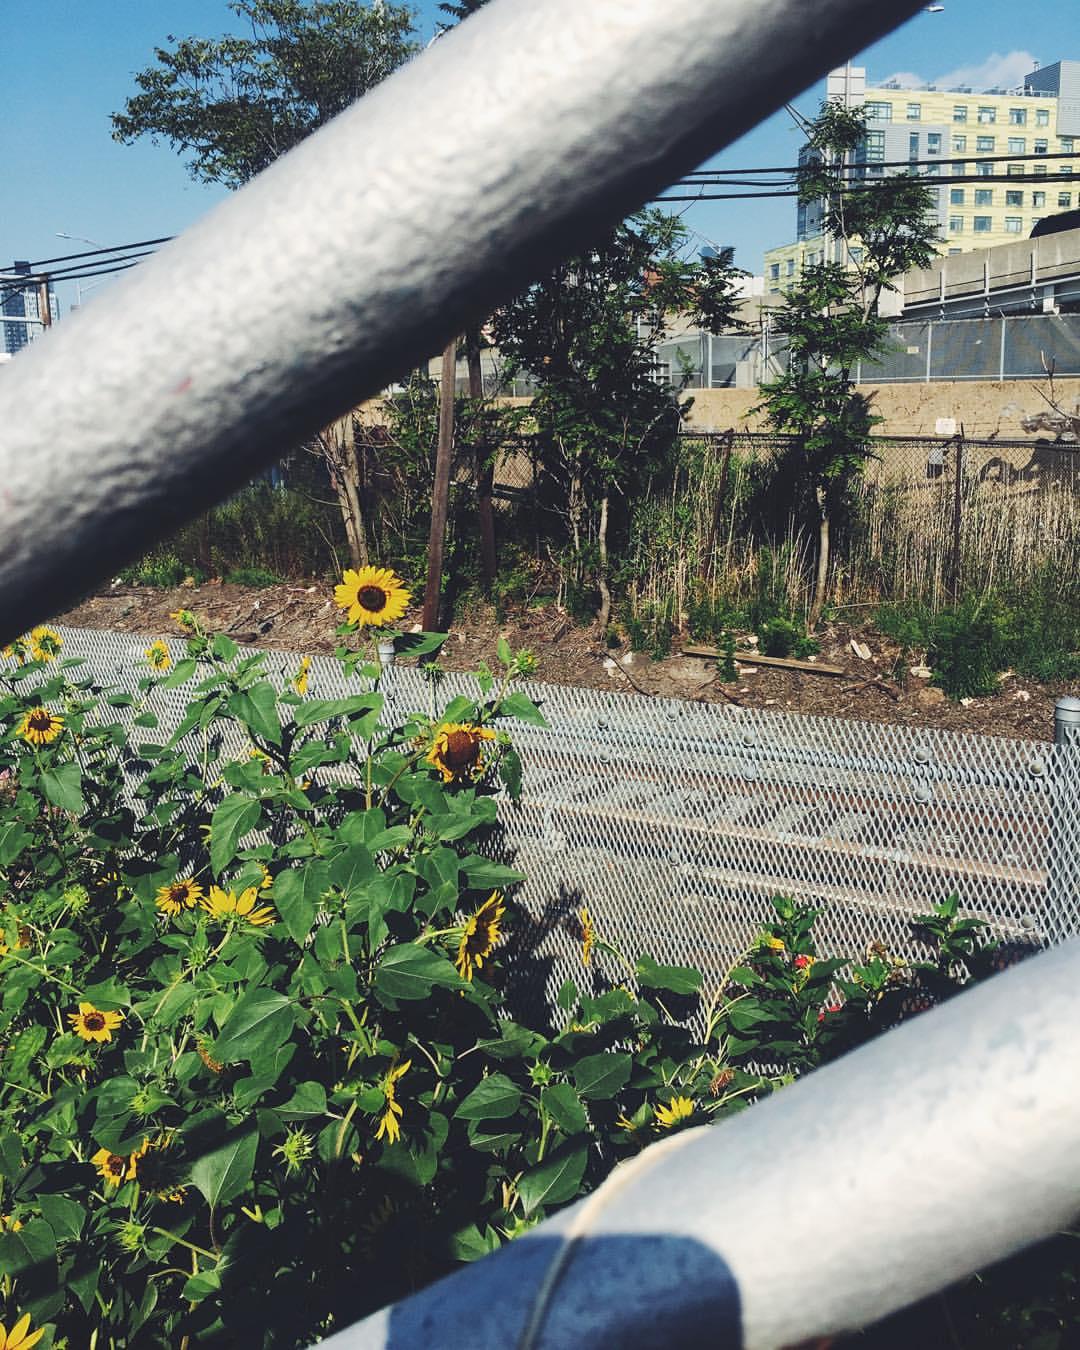 Sunflowers in Long Island City